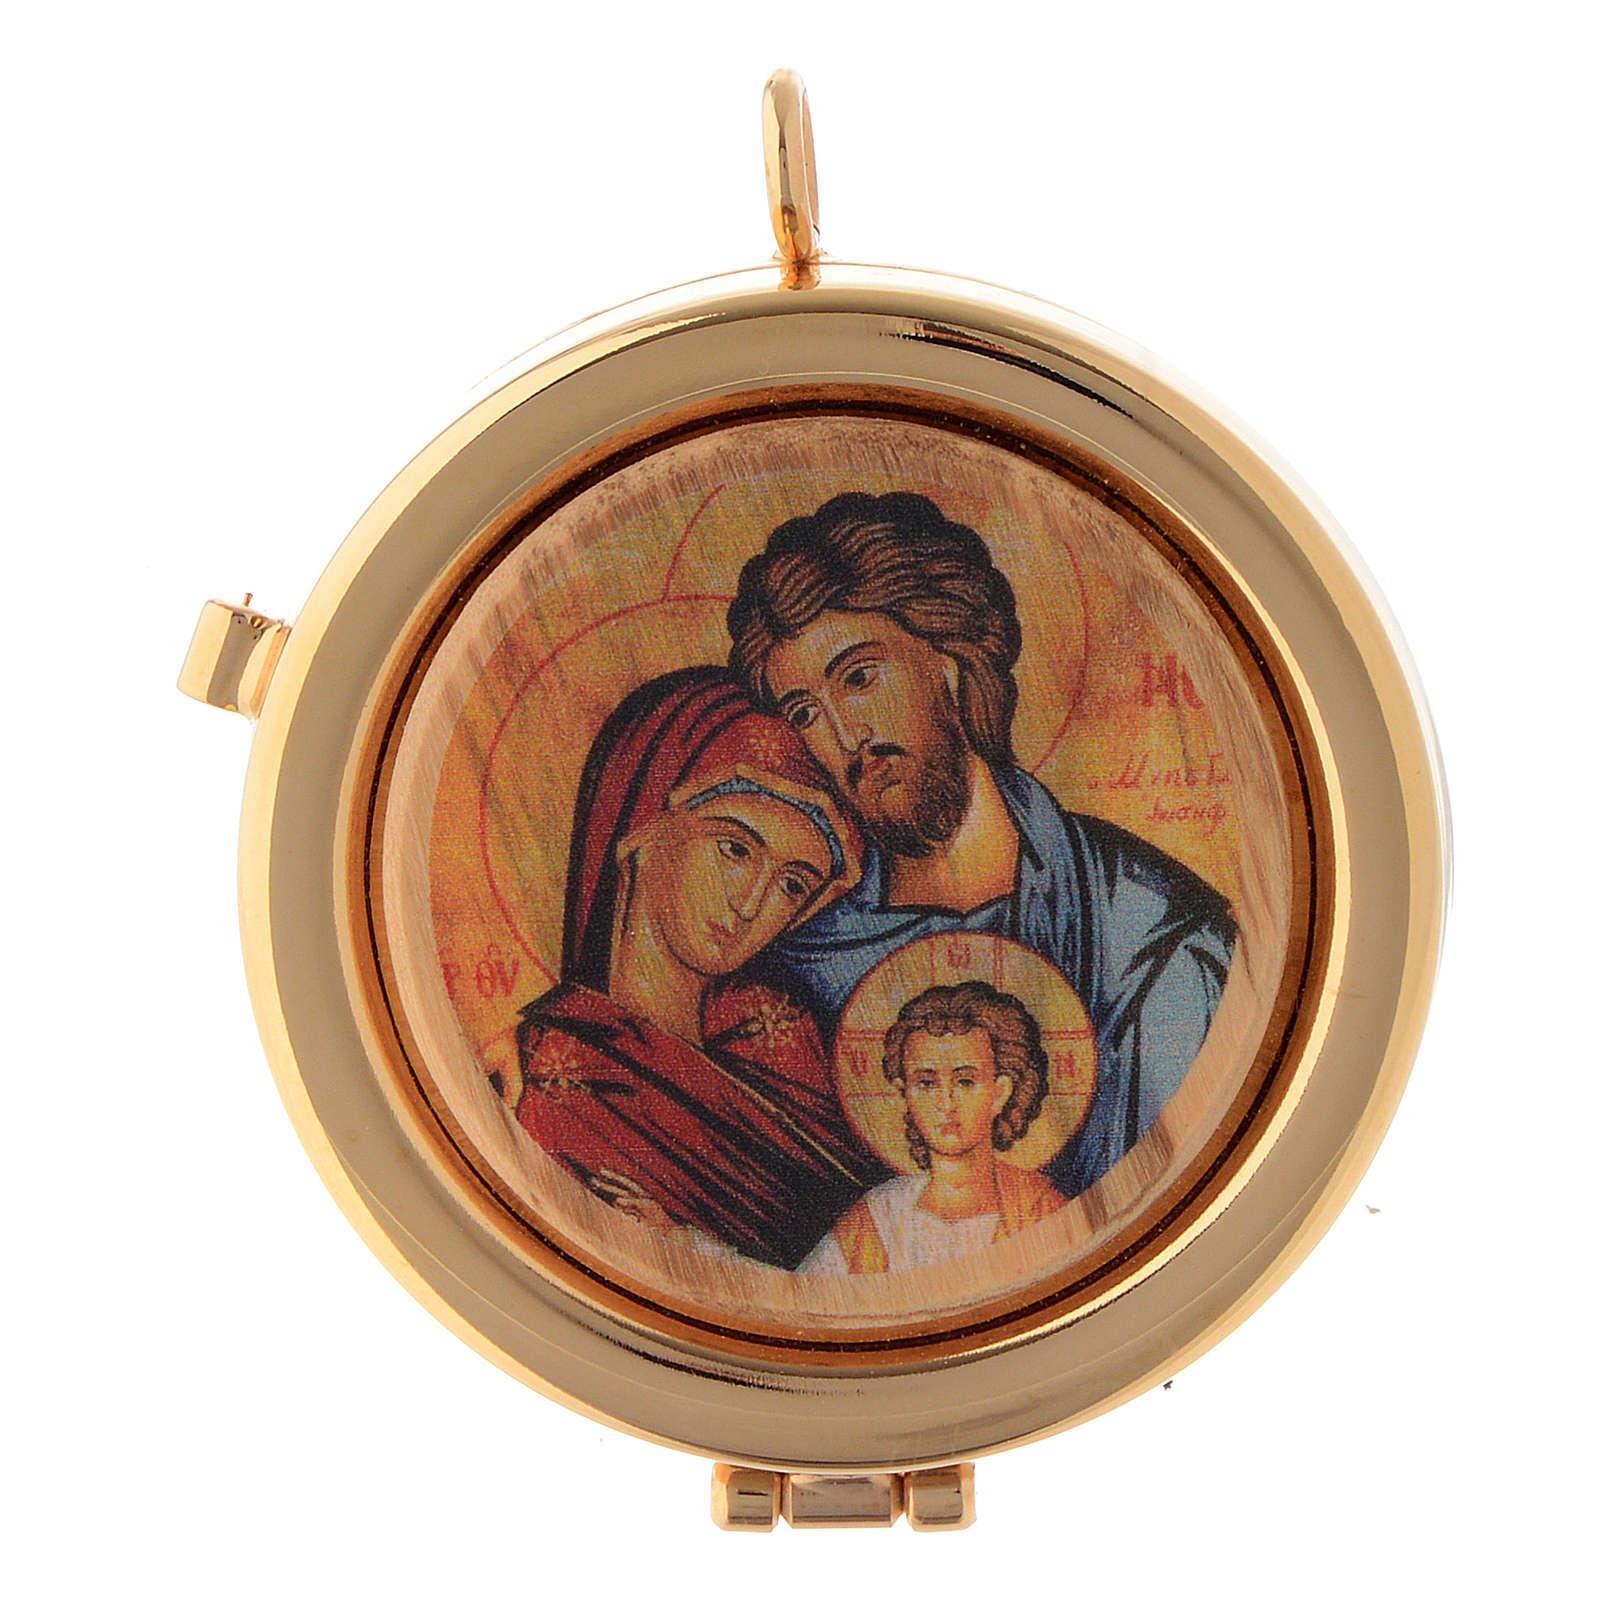 Relicario Eucarístico madera de olivo Sagrada Familia Bizantina diám. 6 cm 3